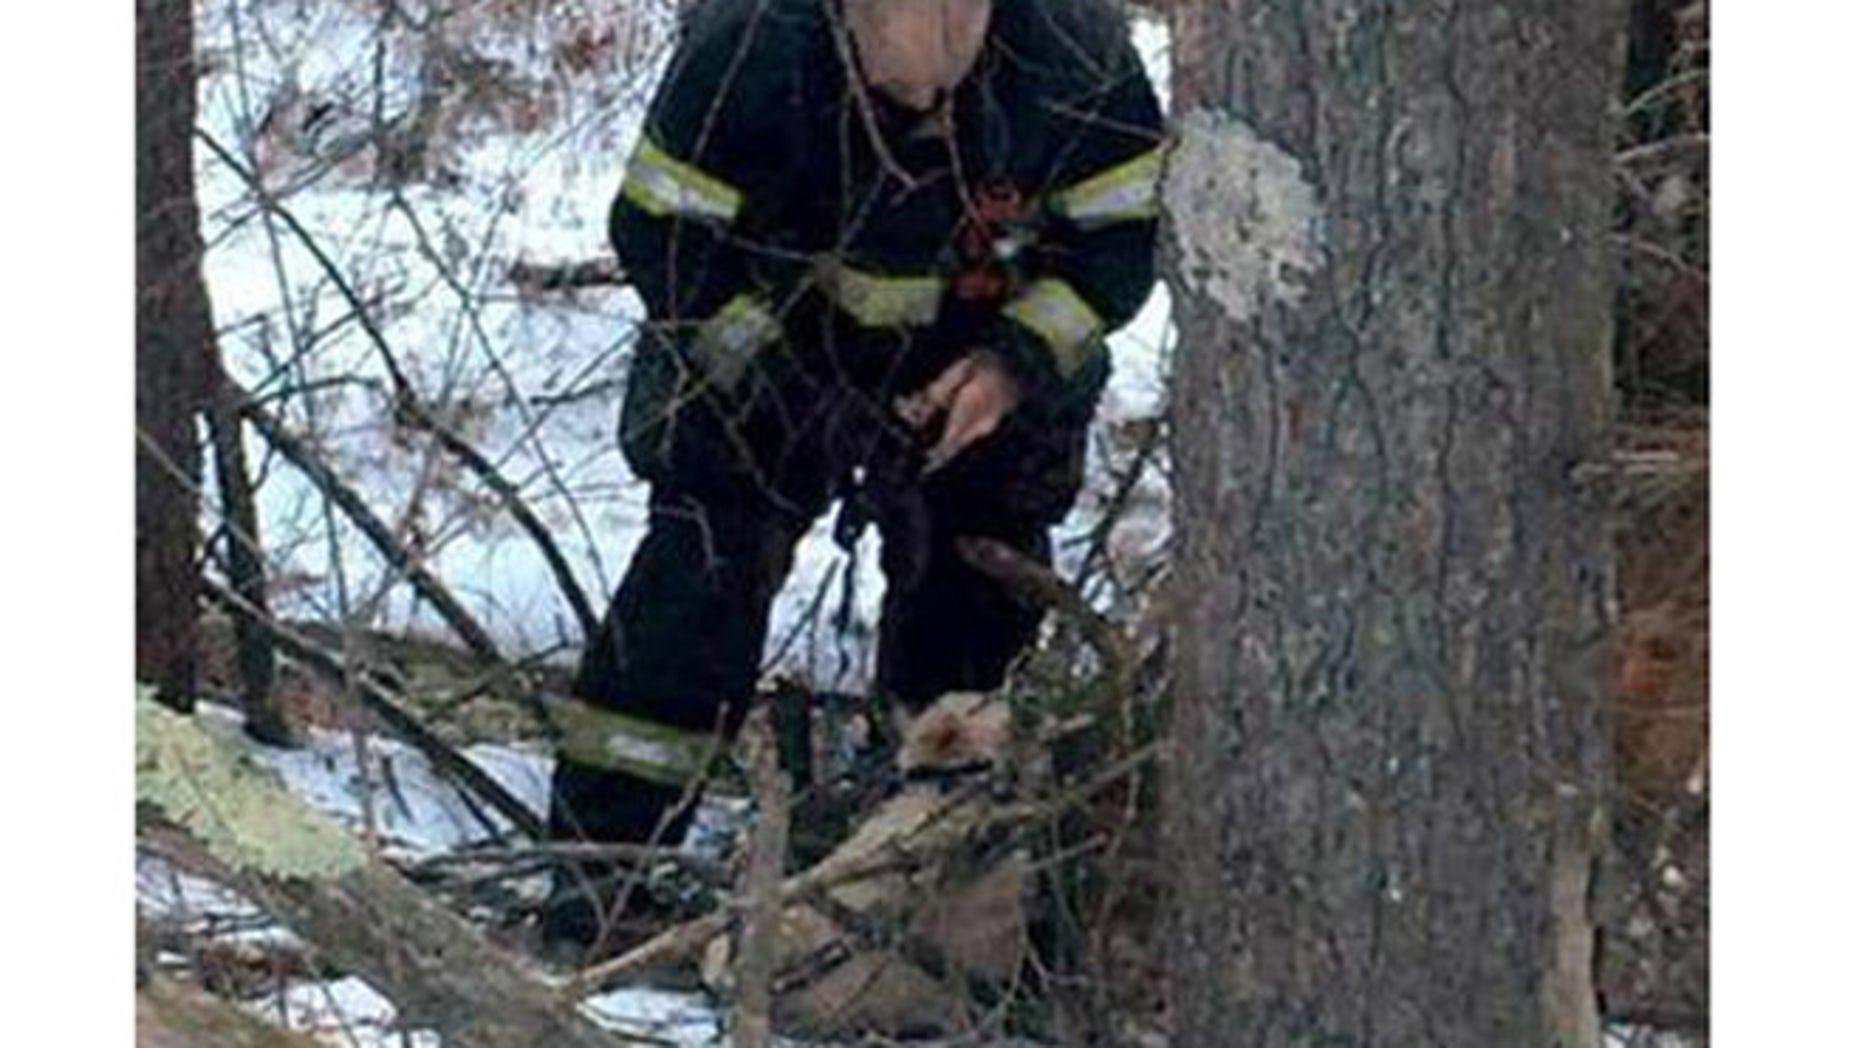 Firefighter works to untangle injured dog, Annabellle. (Orange Police Department)